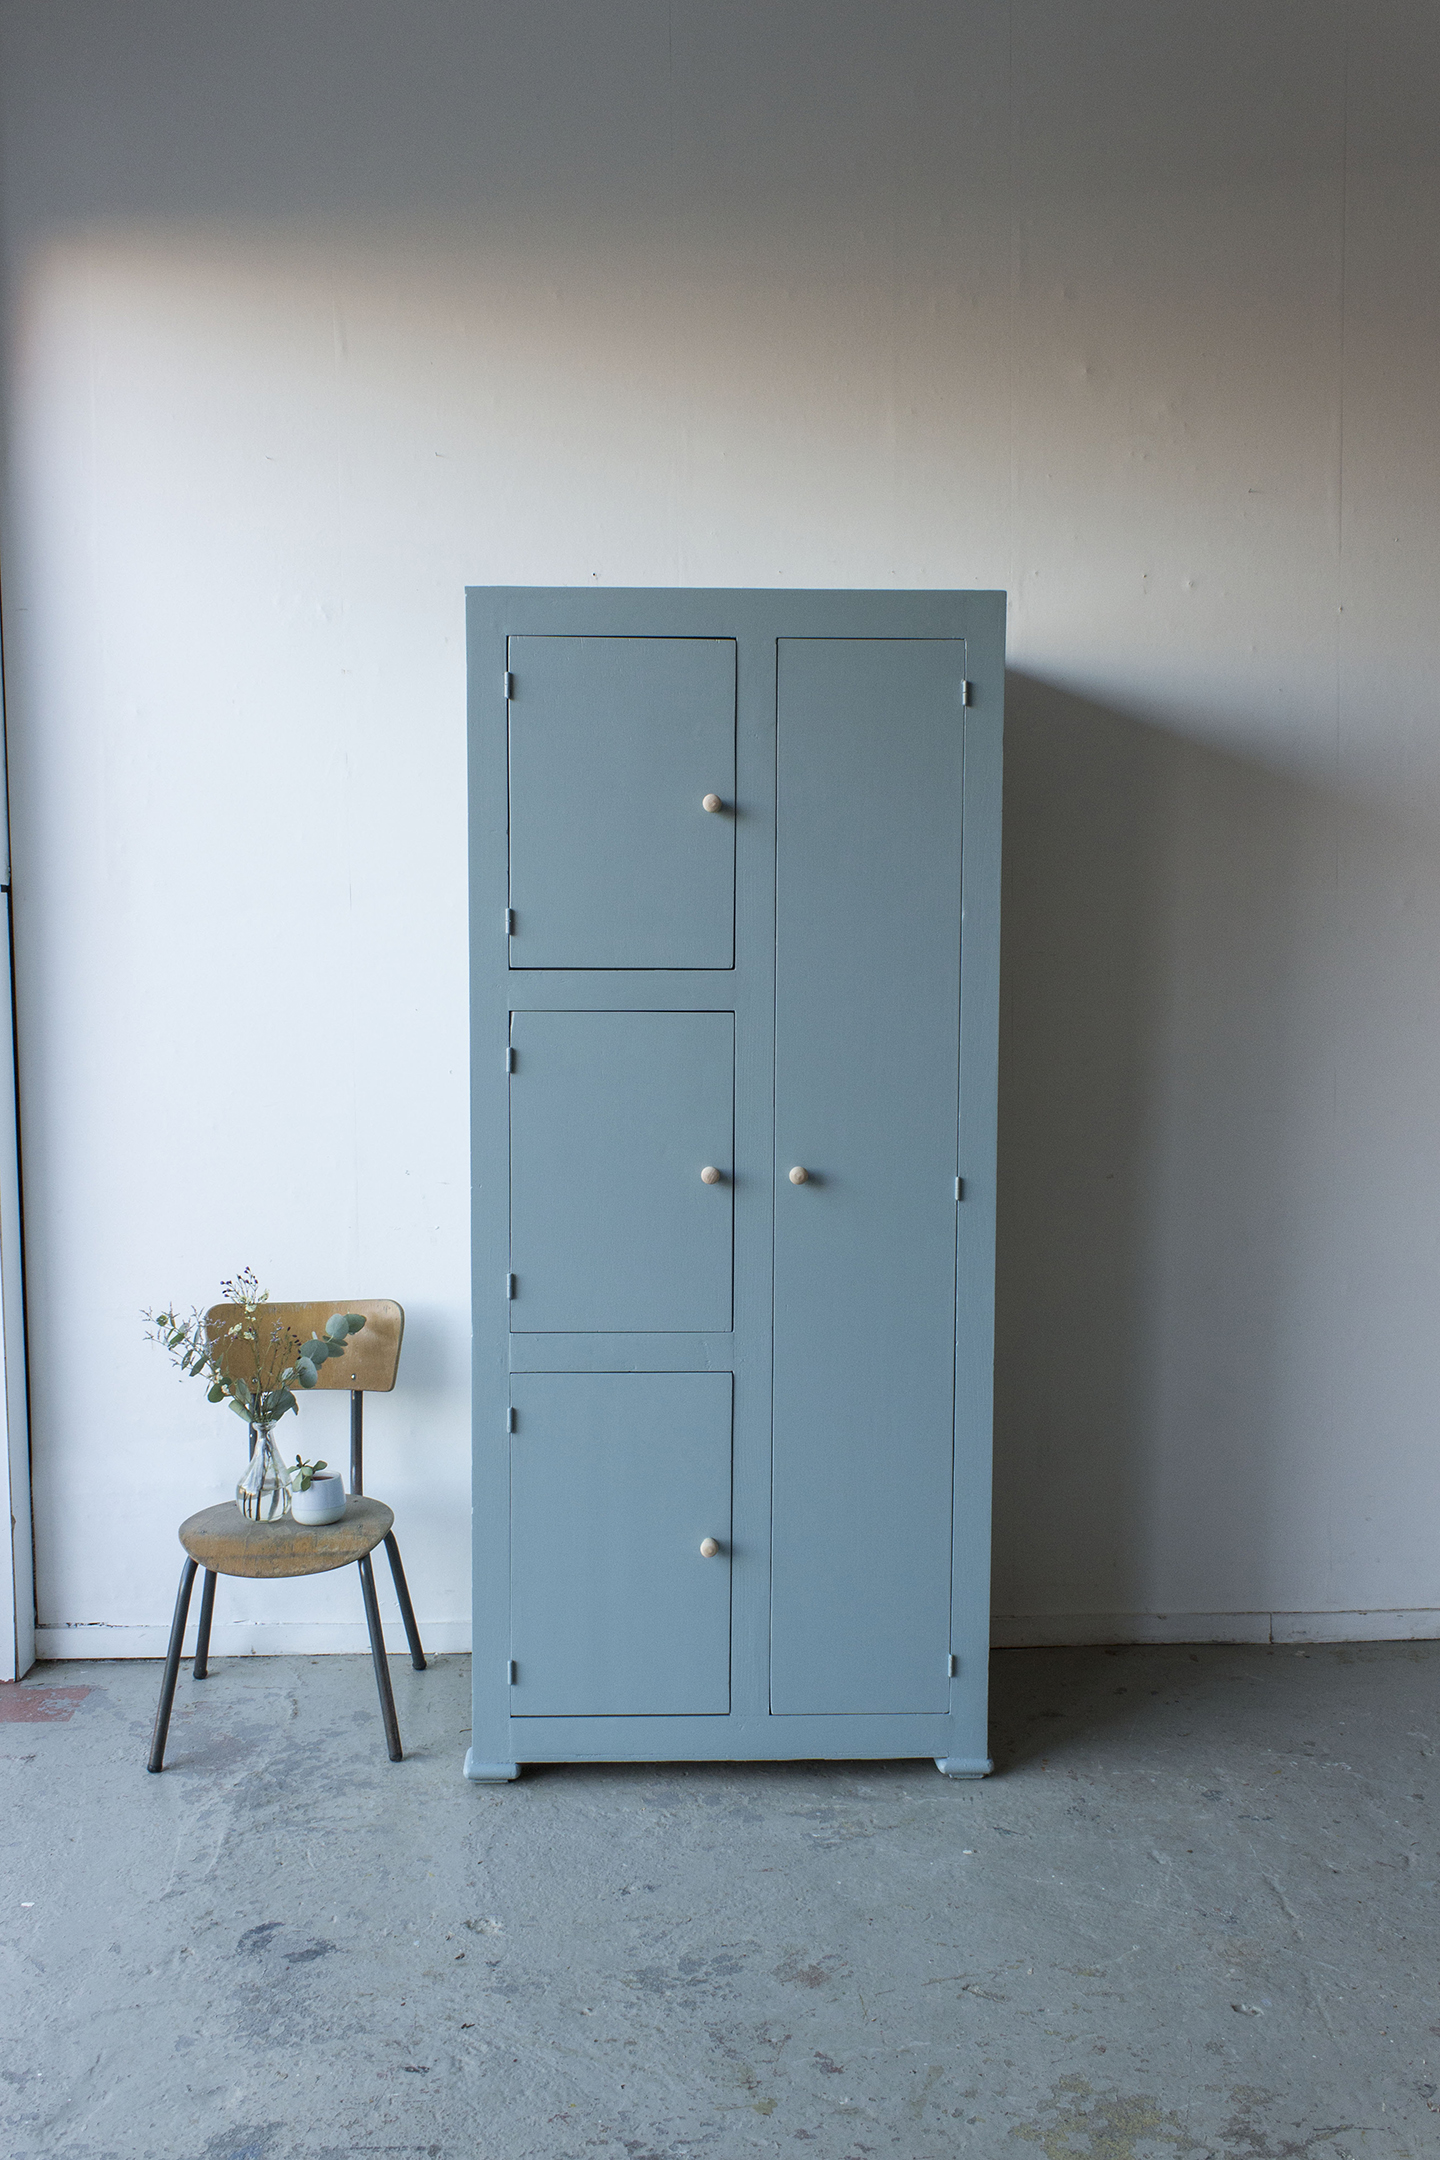 Kust blauwe vintage kledingkast -  Firma zoethout_5.jpg